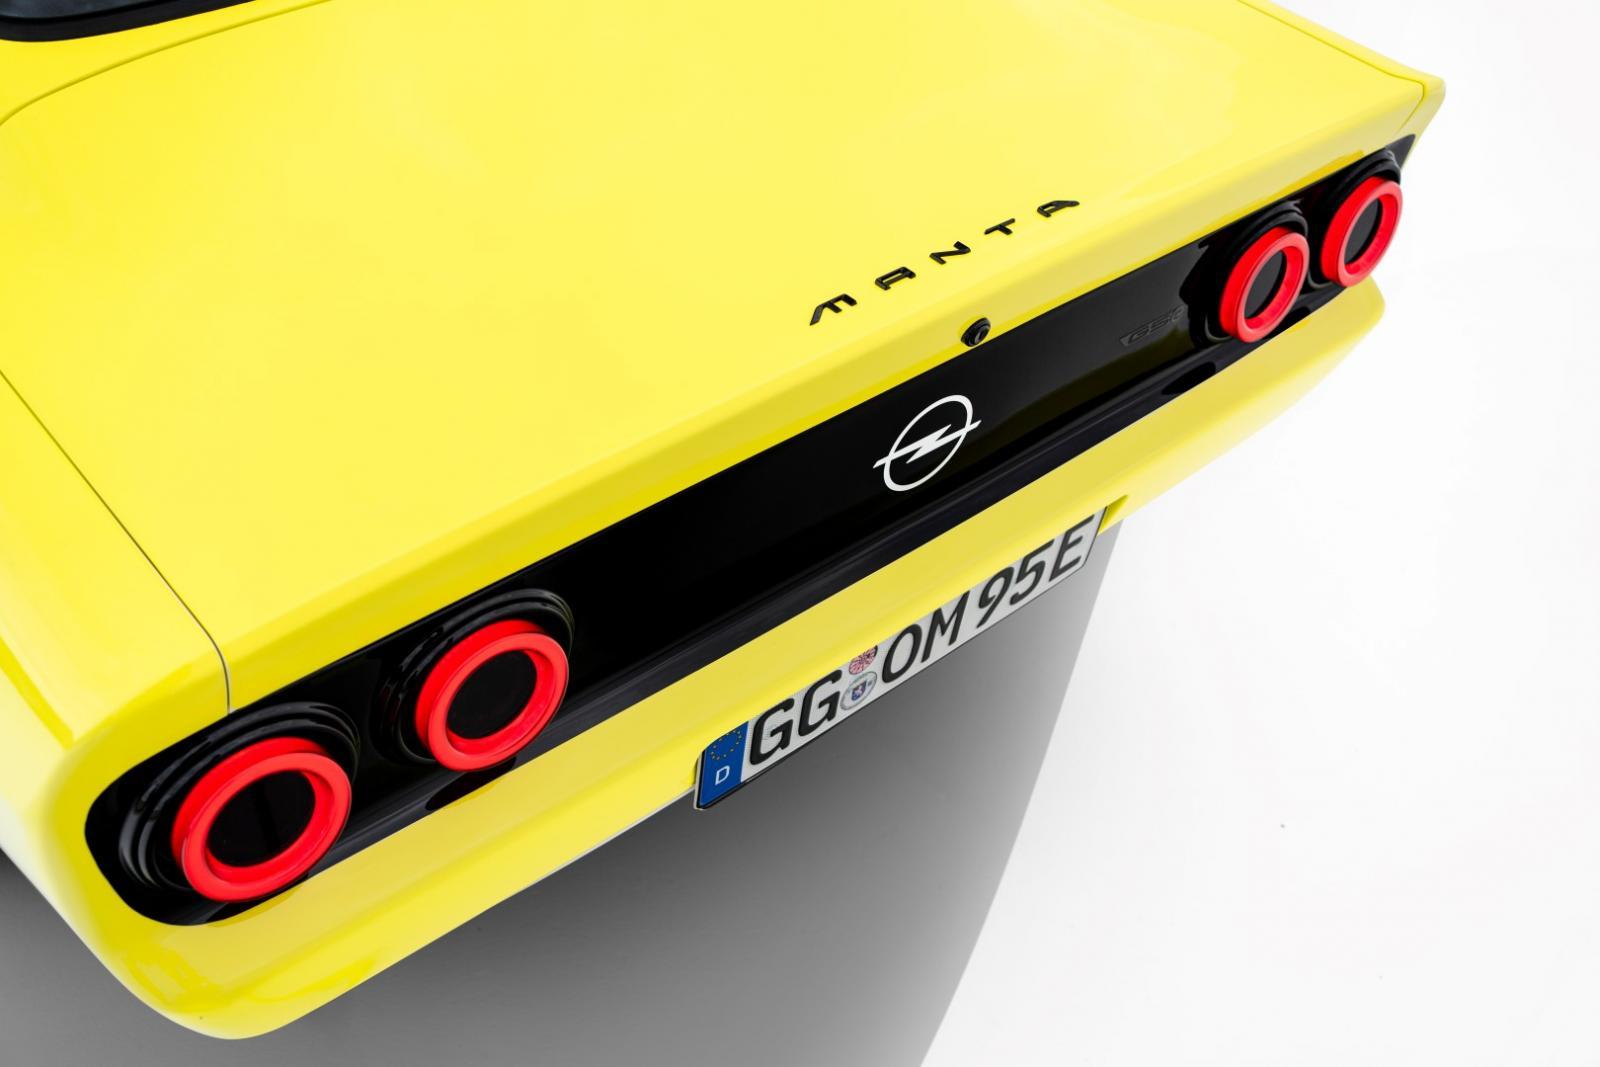 07_Opel-Manta-GSe-ElektroMOD-515663 (Large).jpg